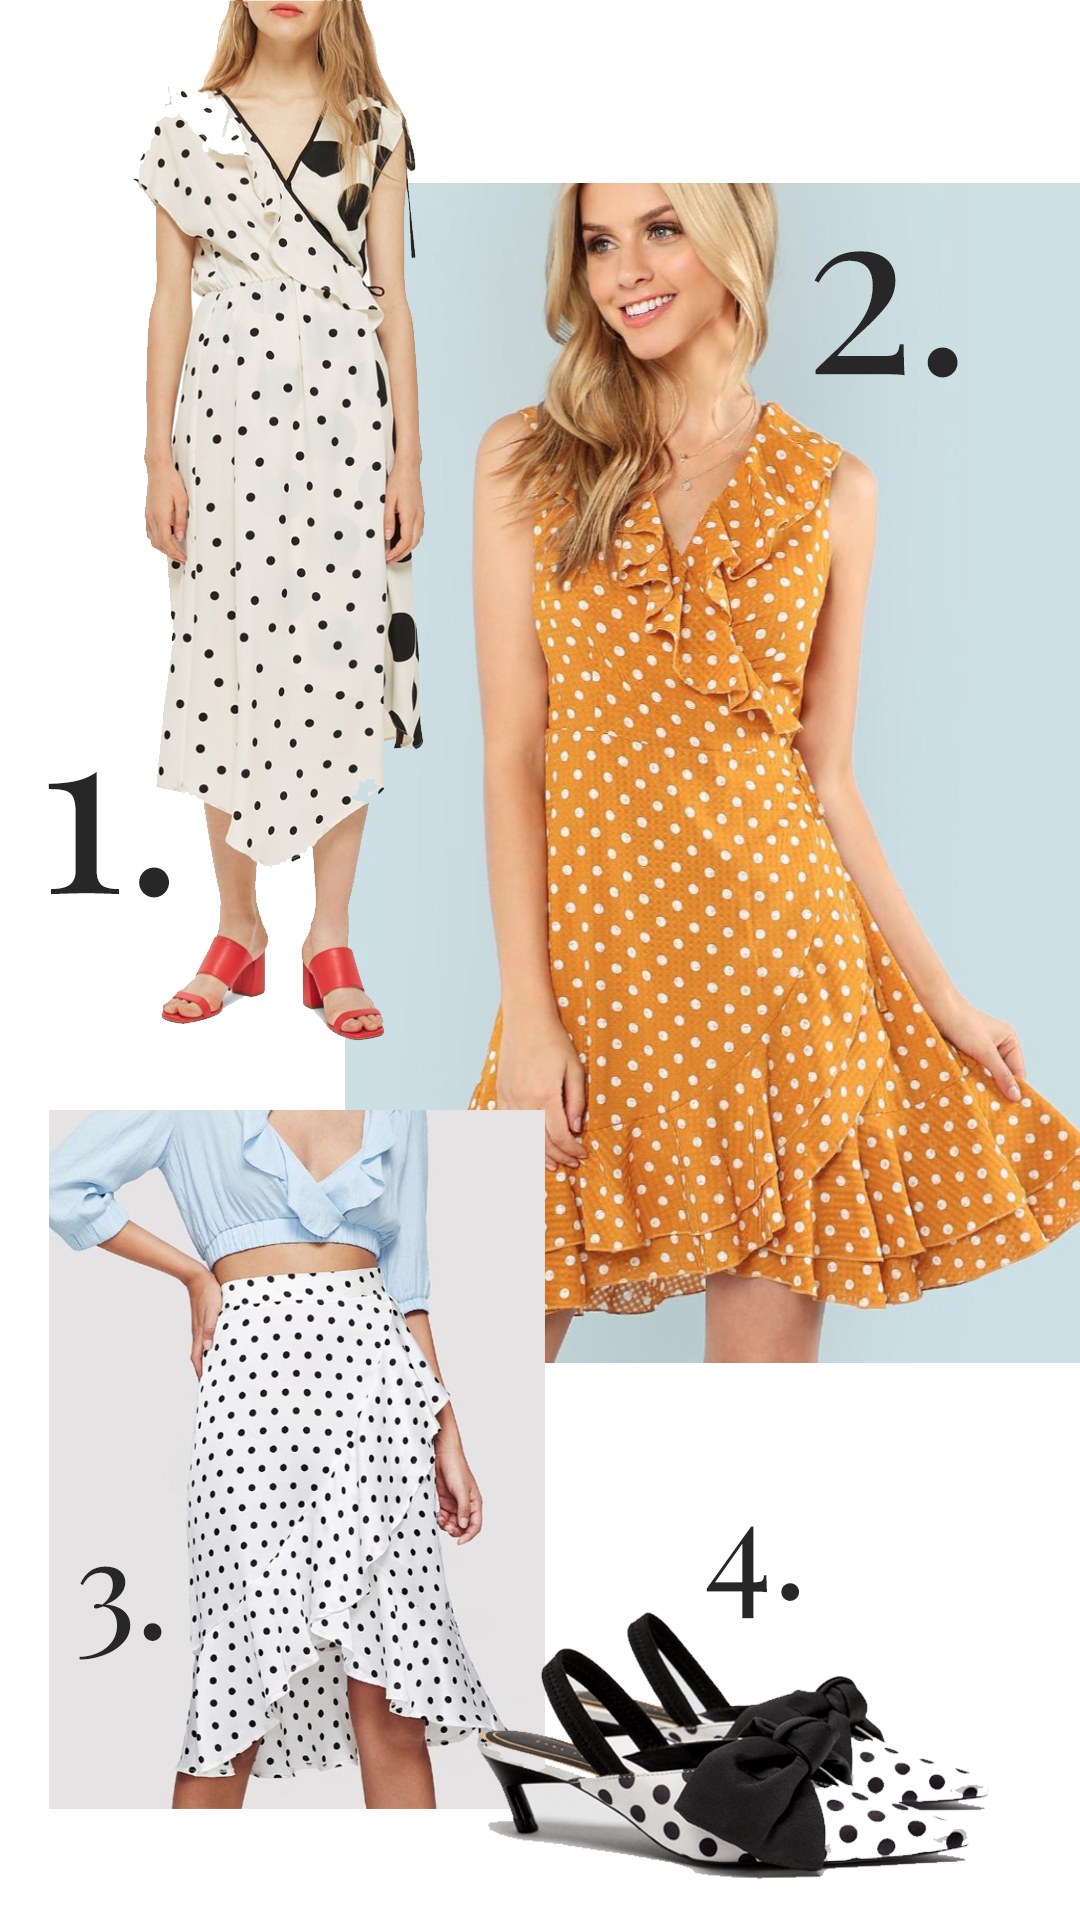 Polka-dot-report-shop-polka-dot-outfits.jpg